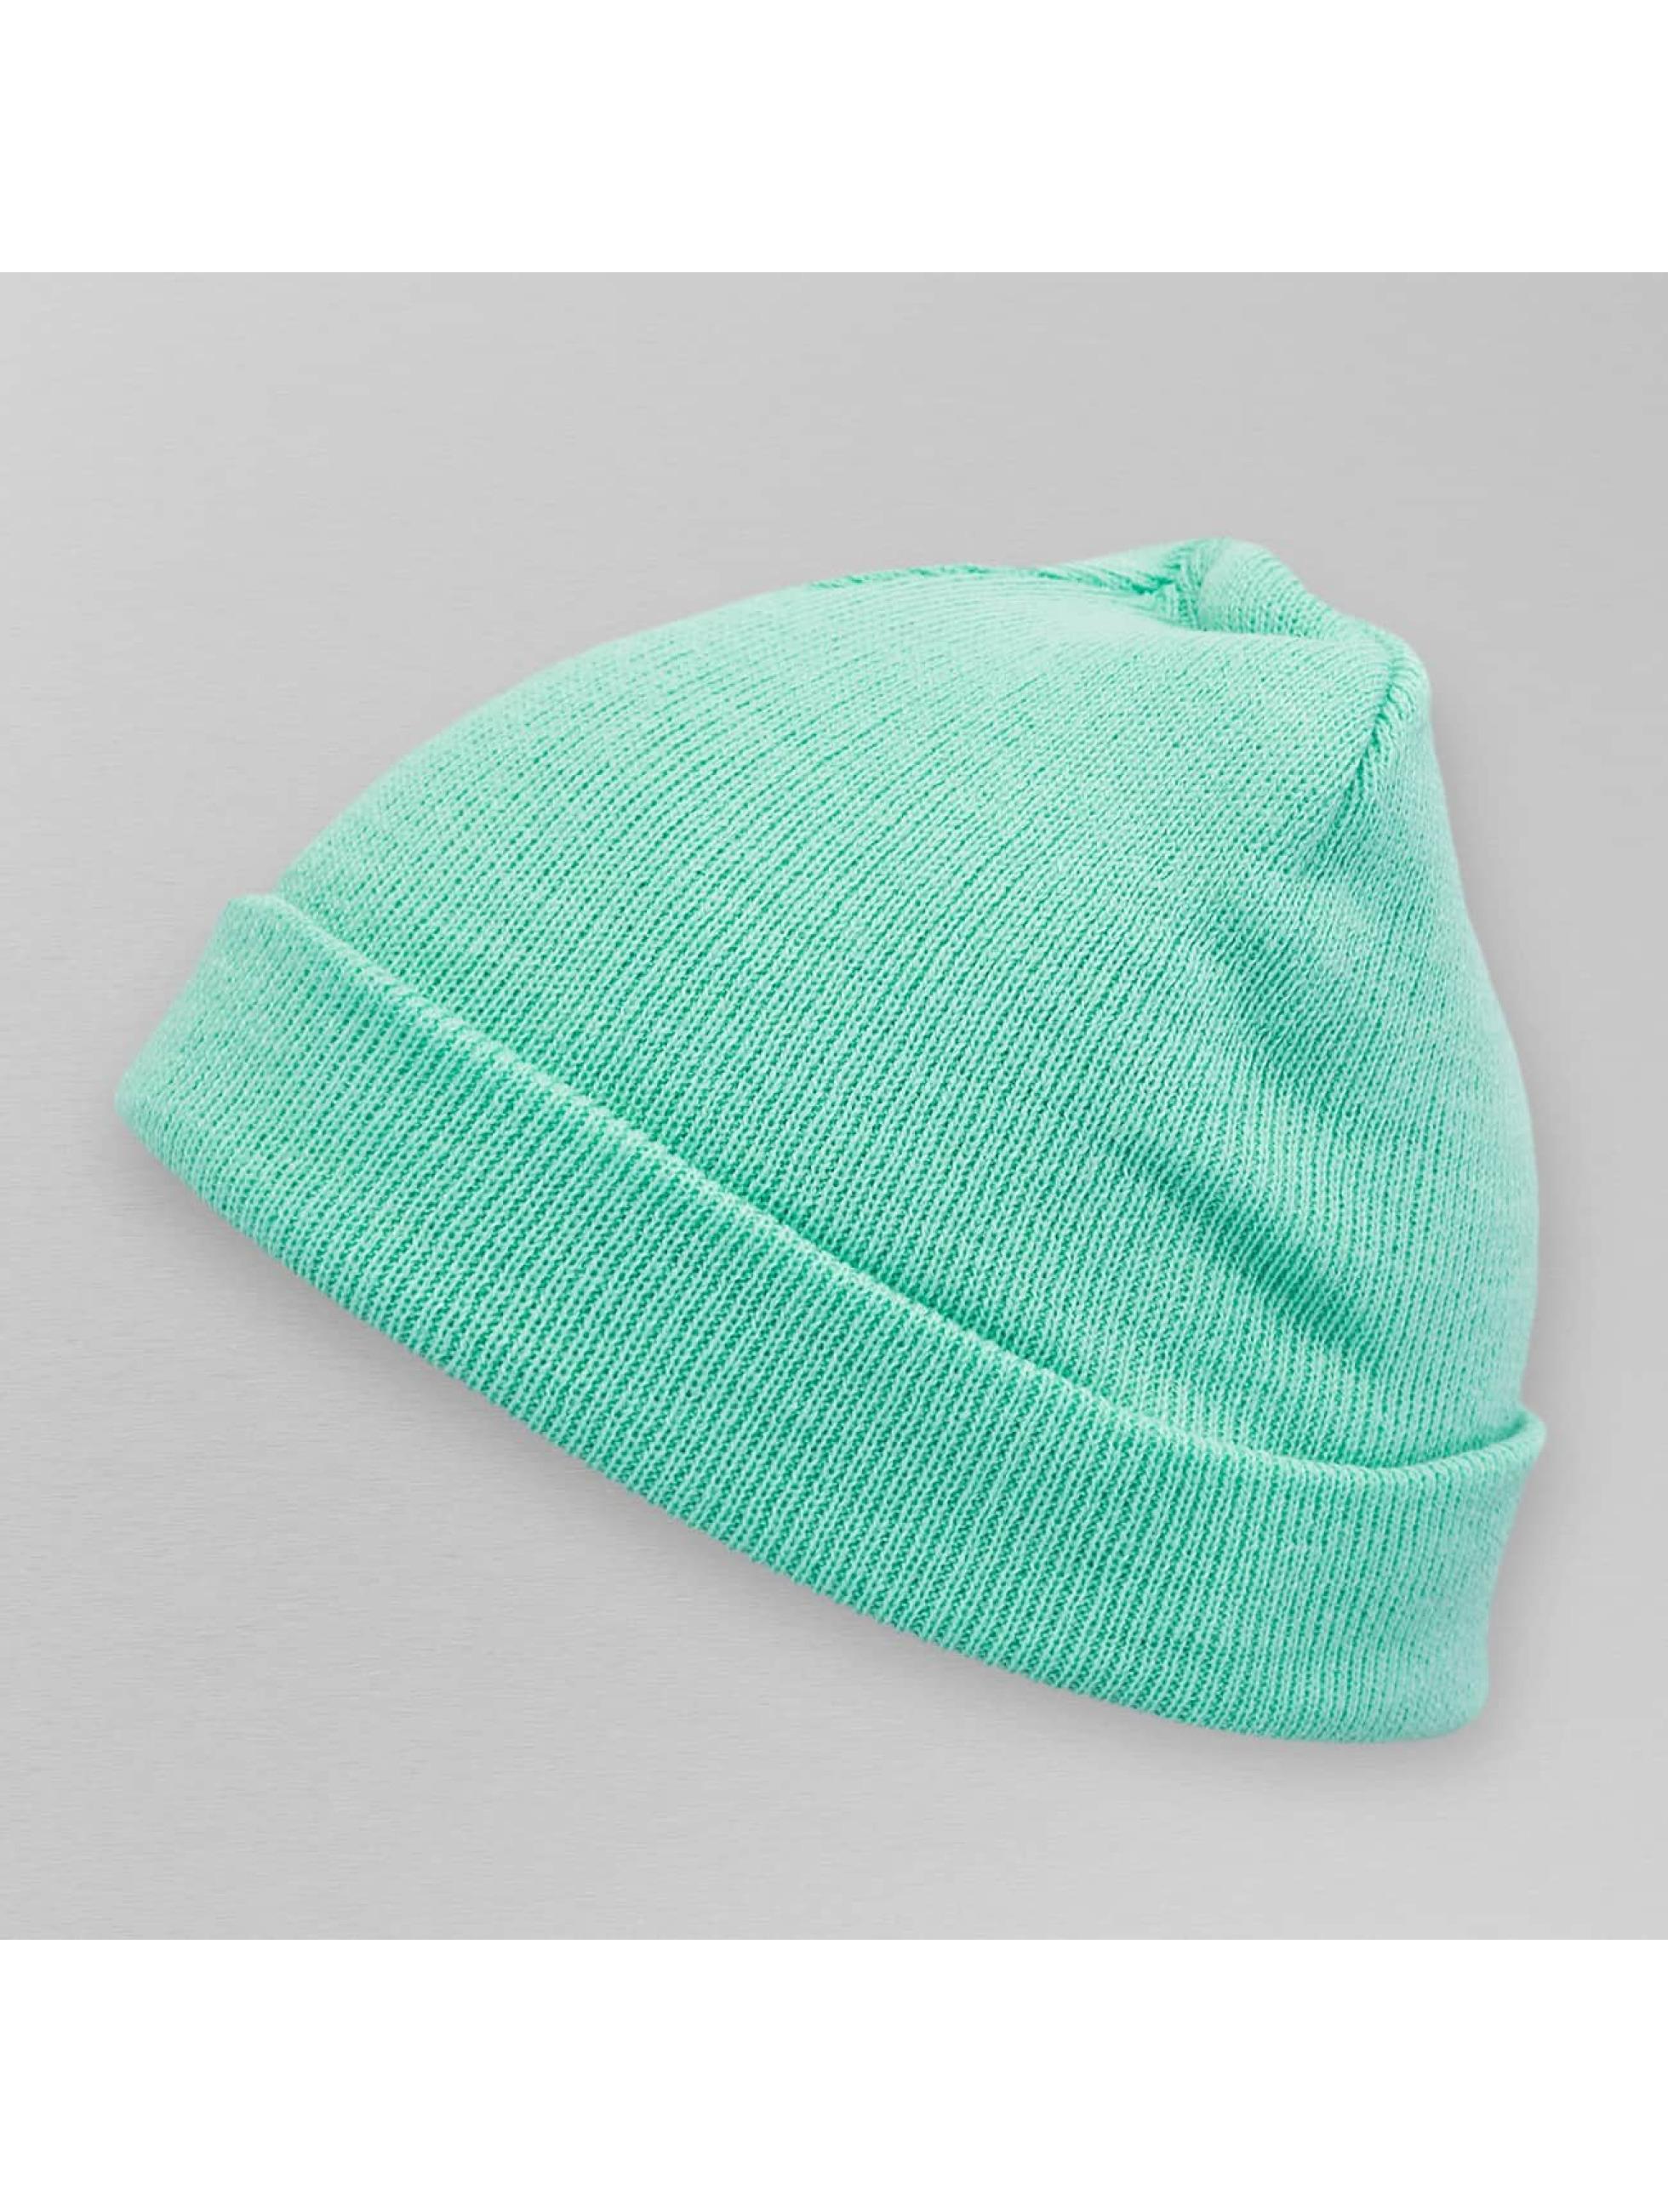 MSTRDS Bonnet Pastel Basic Flap vert